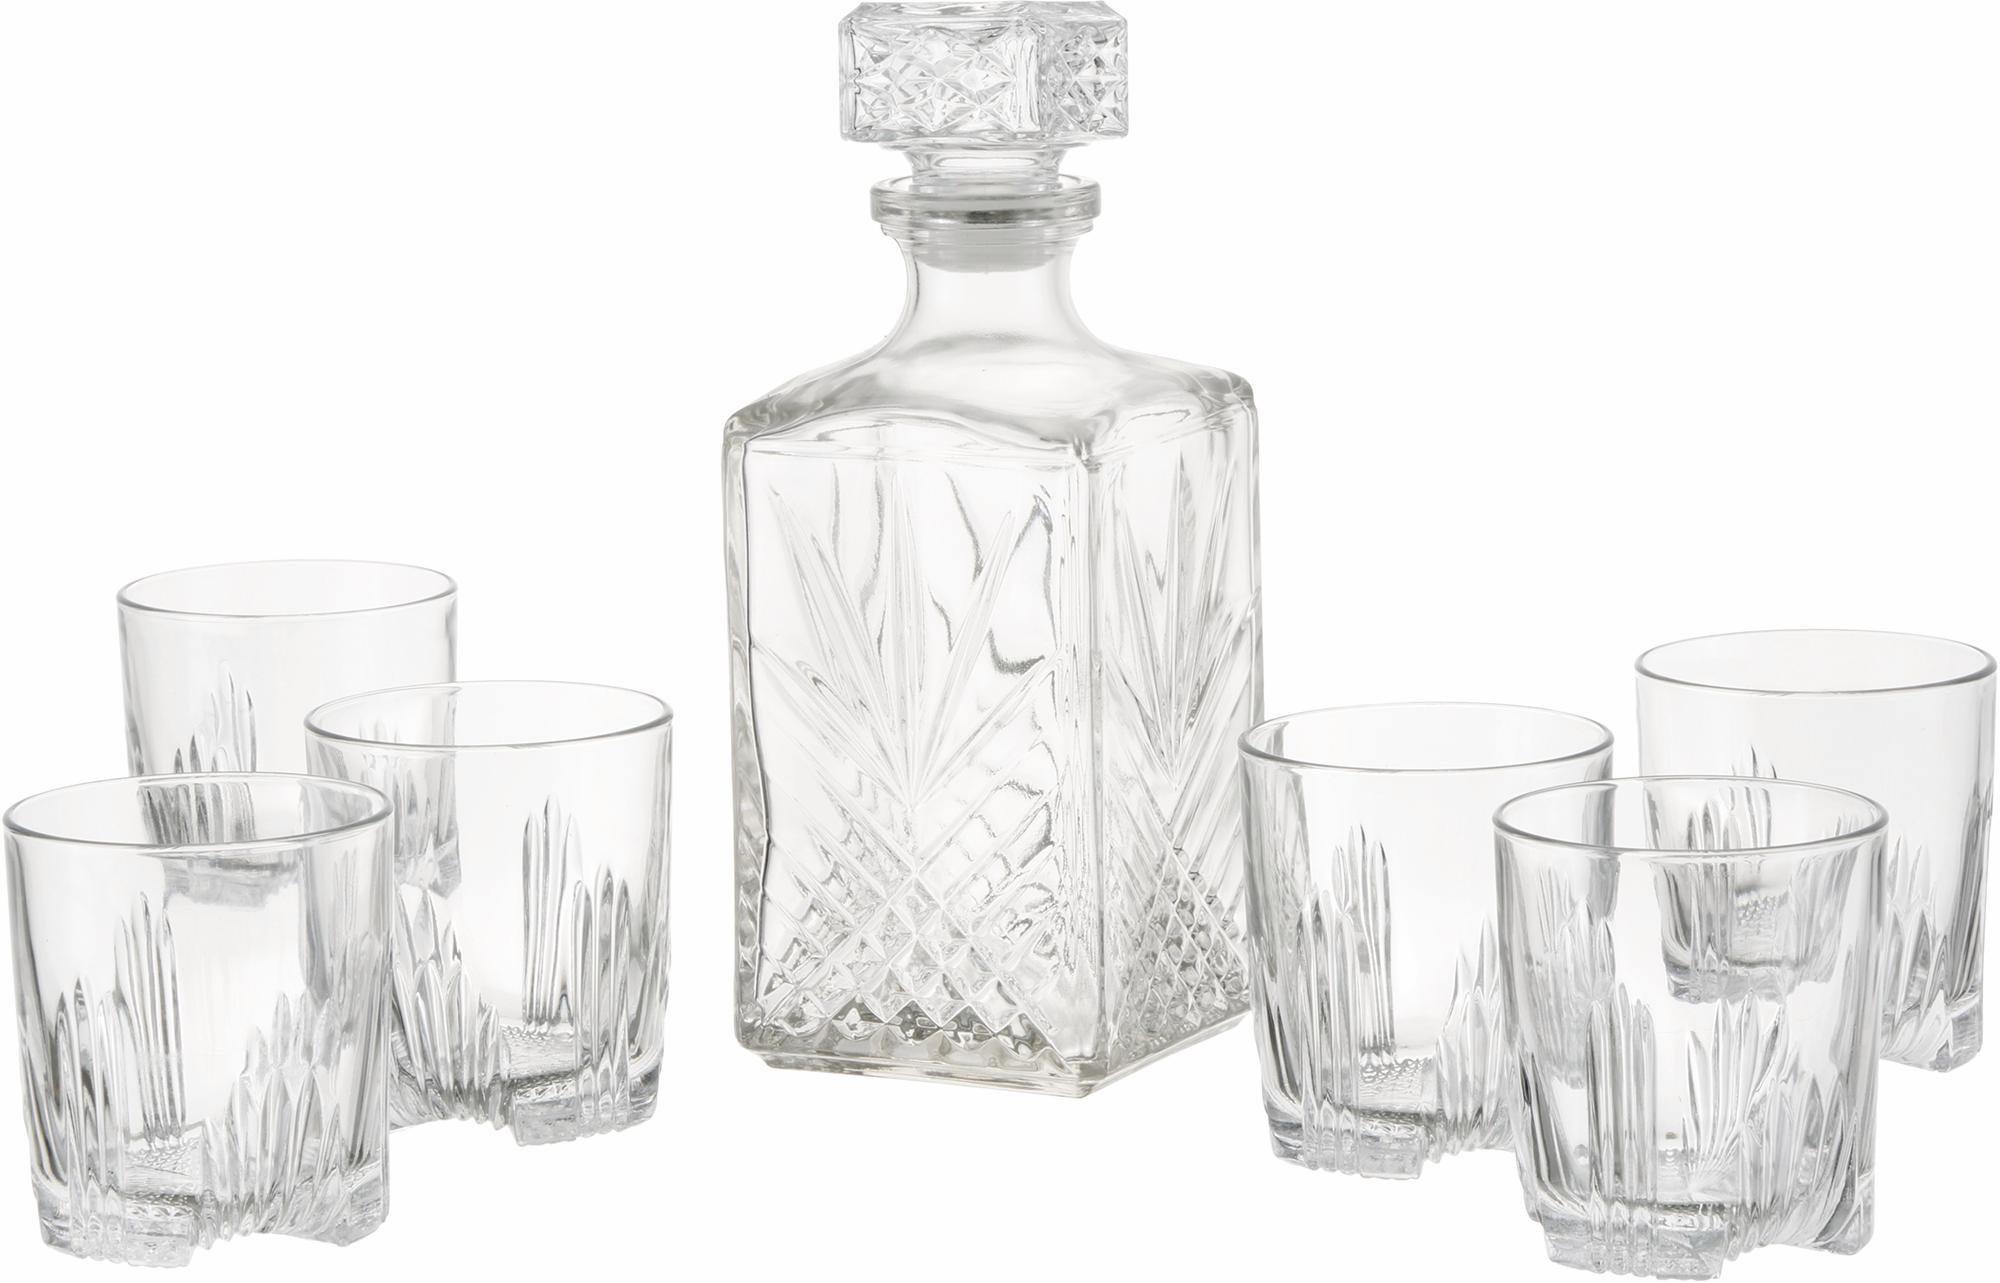 Whiskyglas »Selecta« (7 Stück), Aus hochwertigem Glas